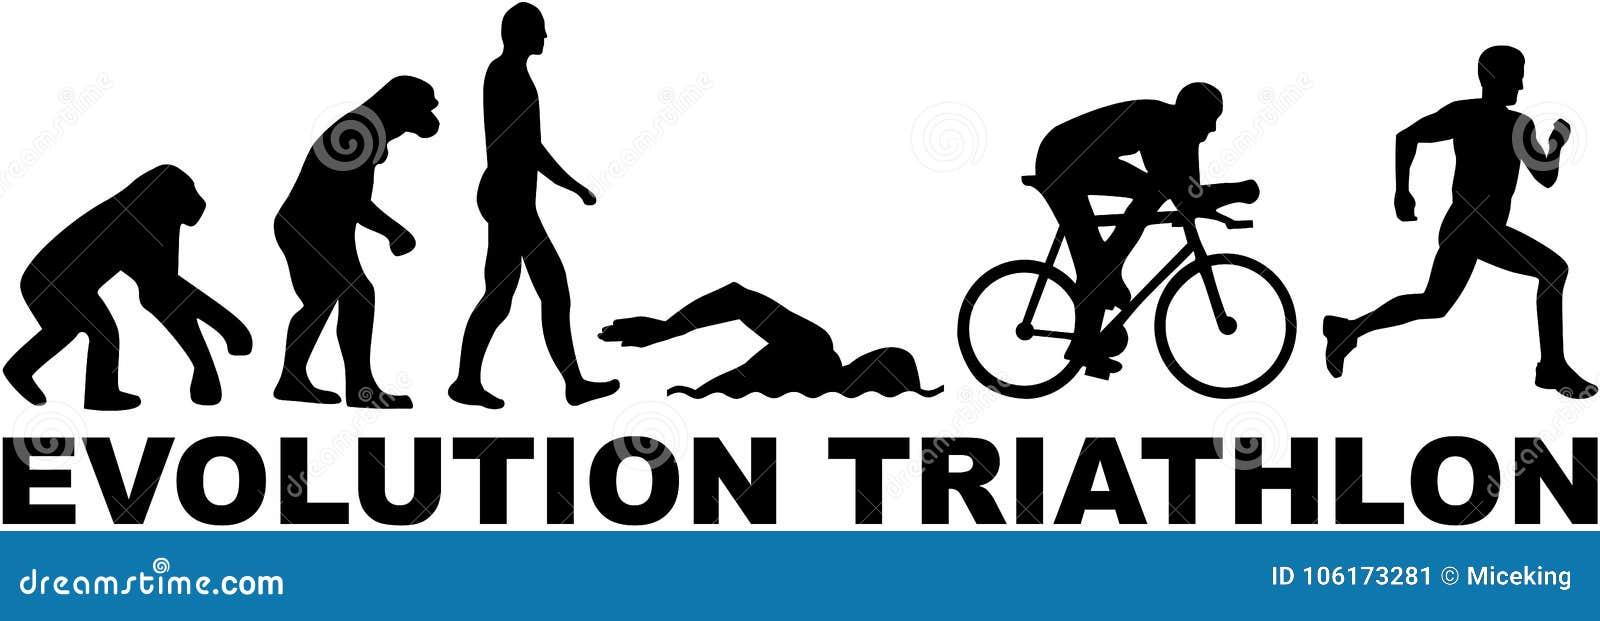 Entwicklung Triathlon